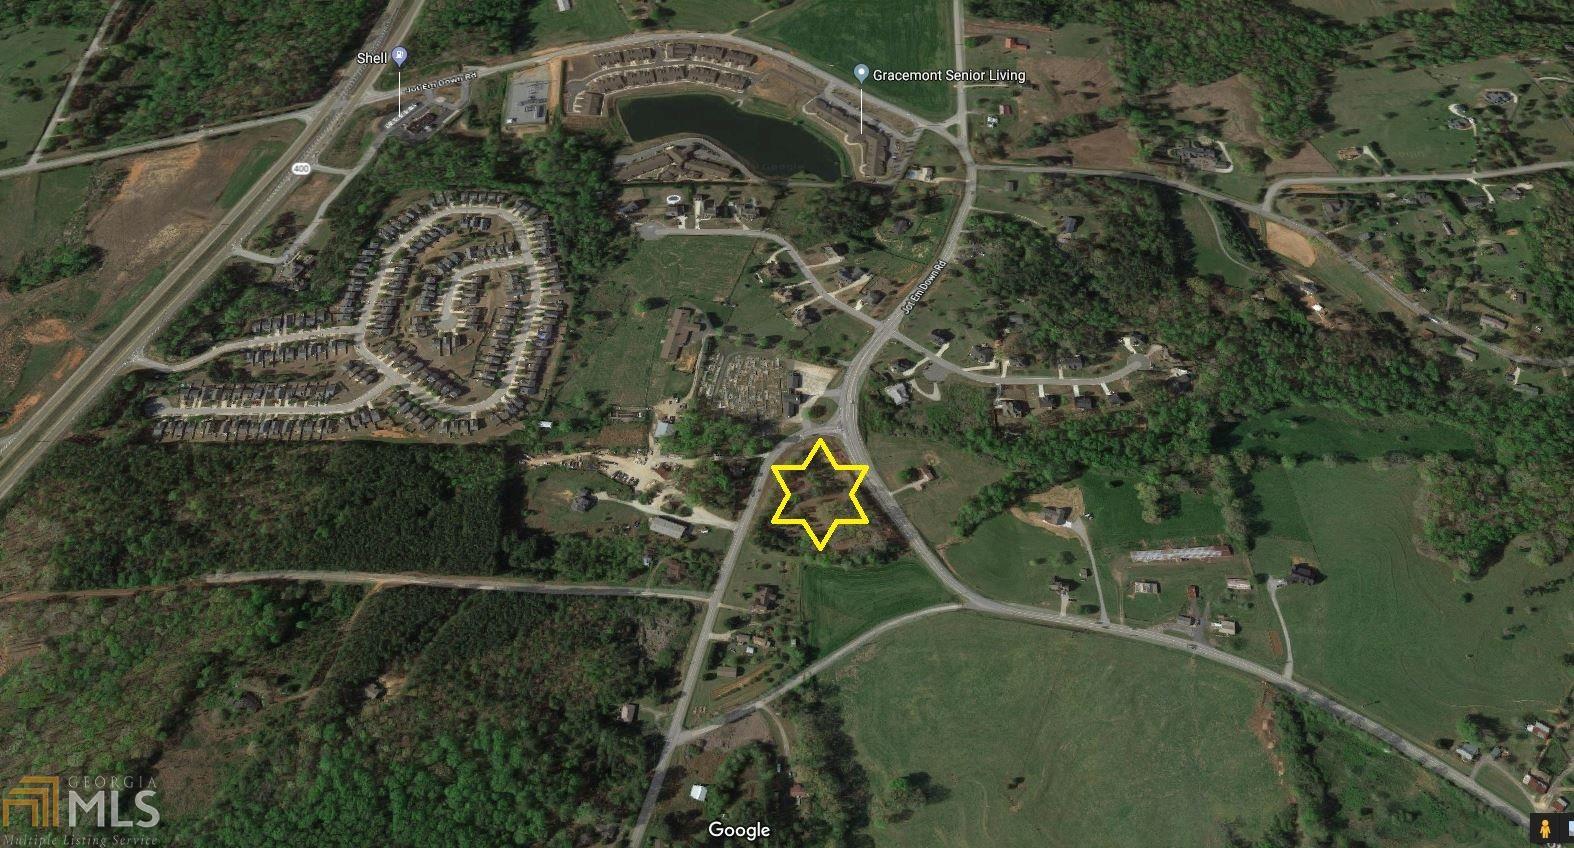 6870 Crossroads, Cumming, Georgia 30041, ,Commercial,For Sale,6870 Crossroads,8358745